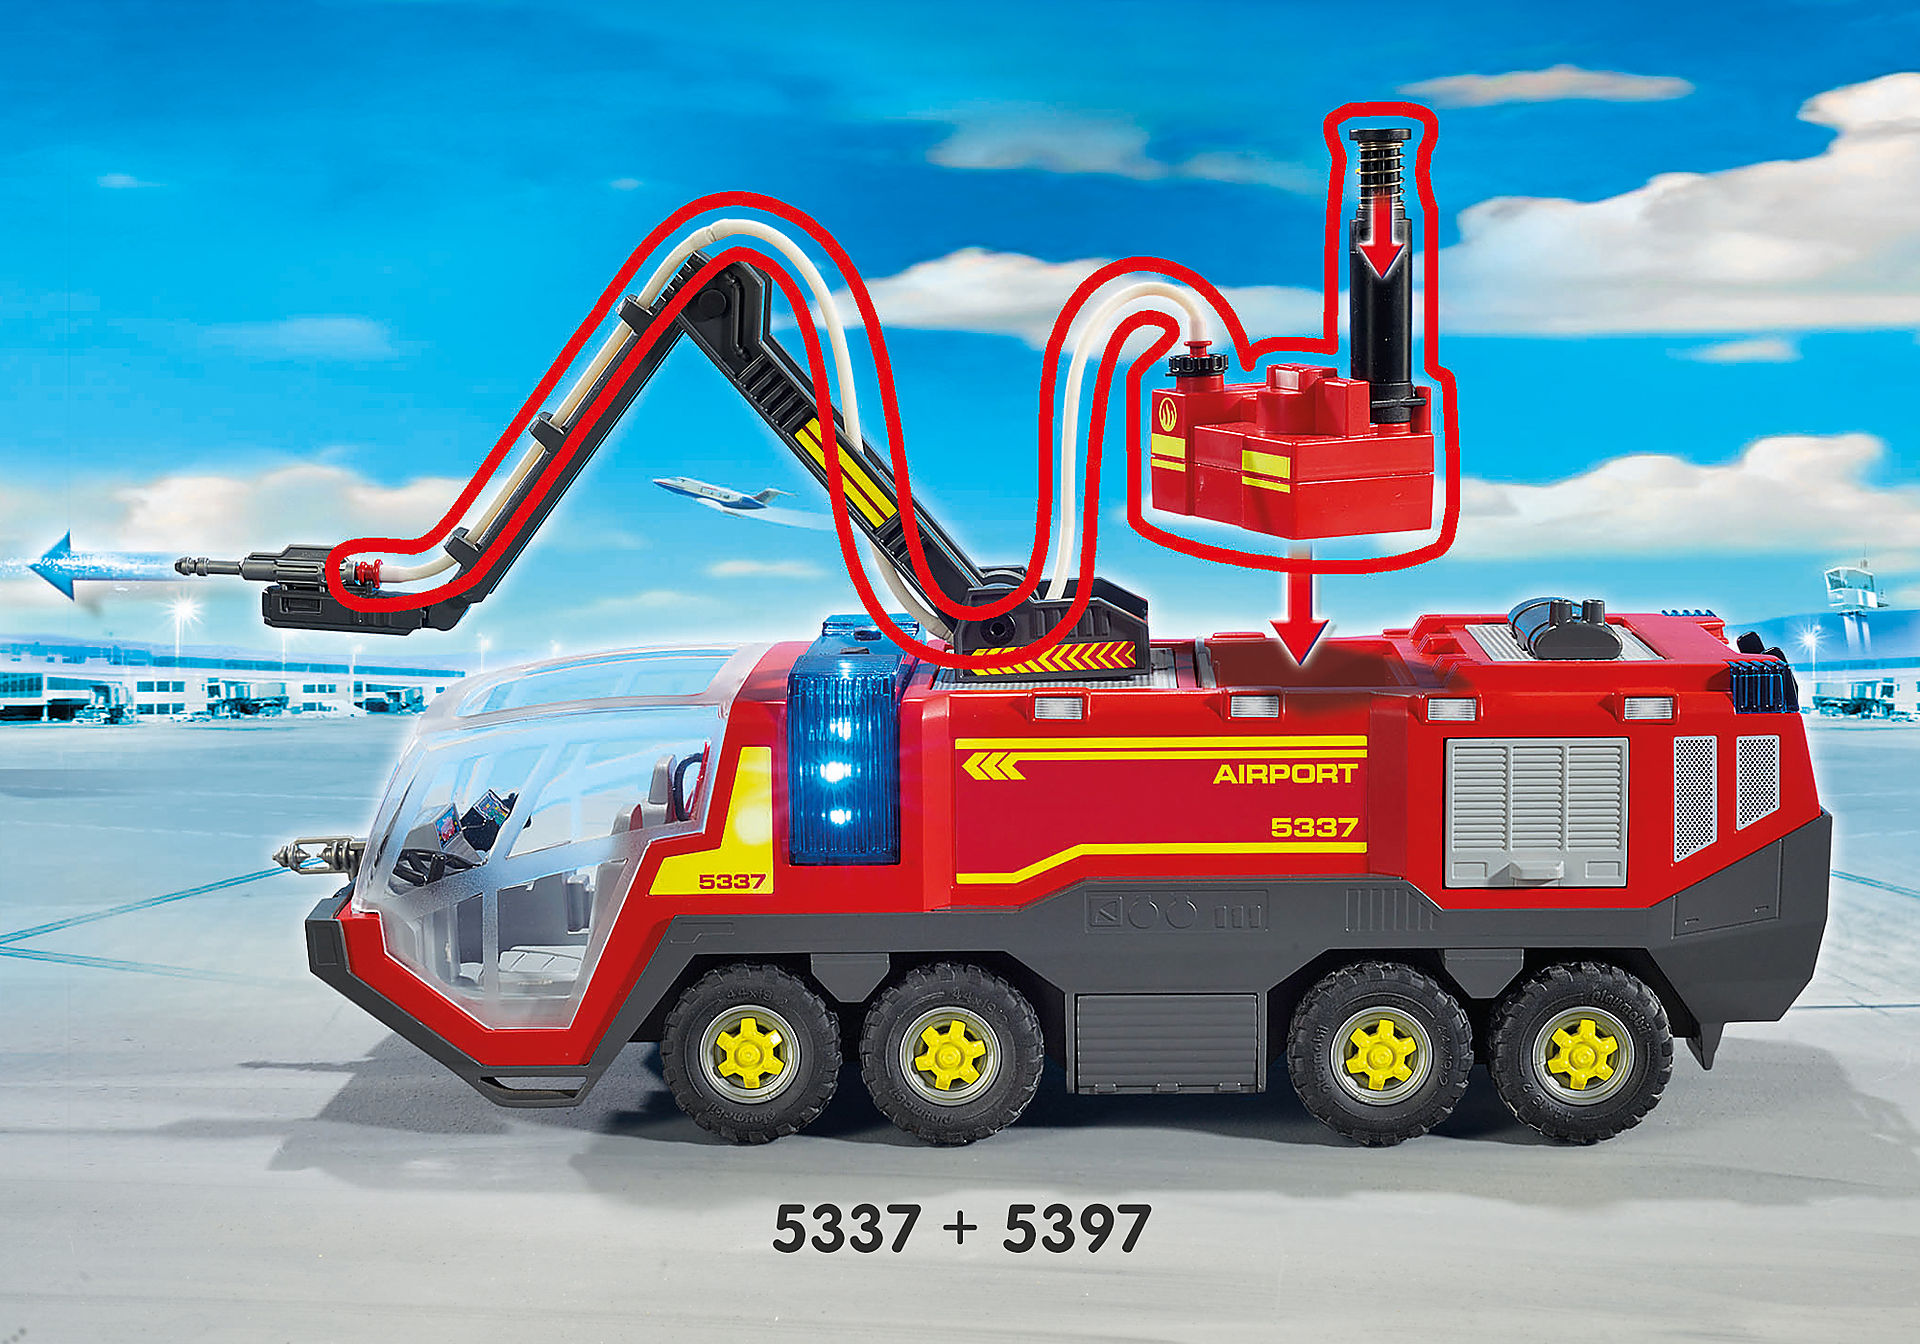 5337 Lufthavnsbrandbil med lys og lyd zoom image9